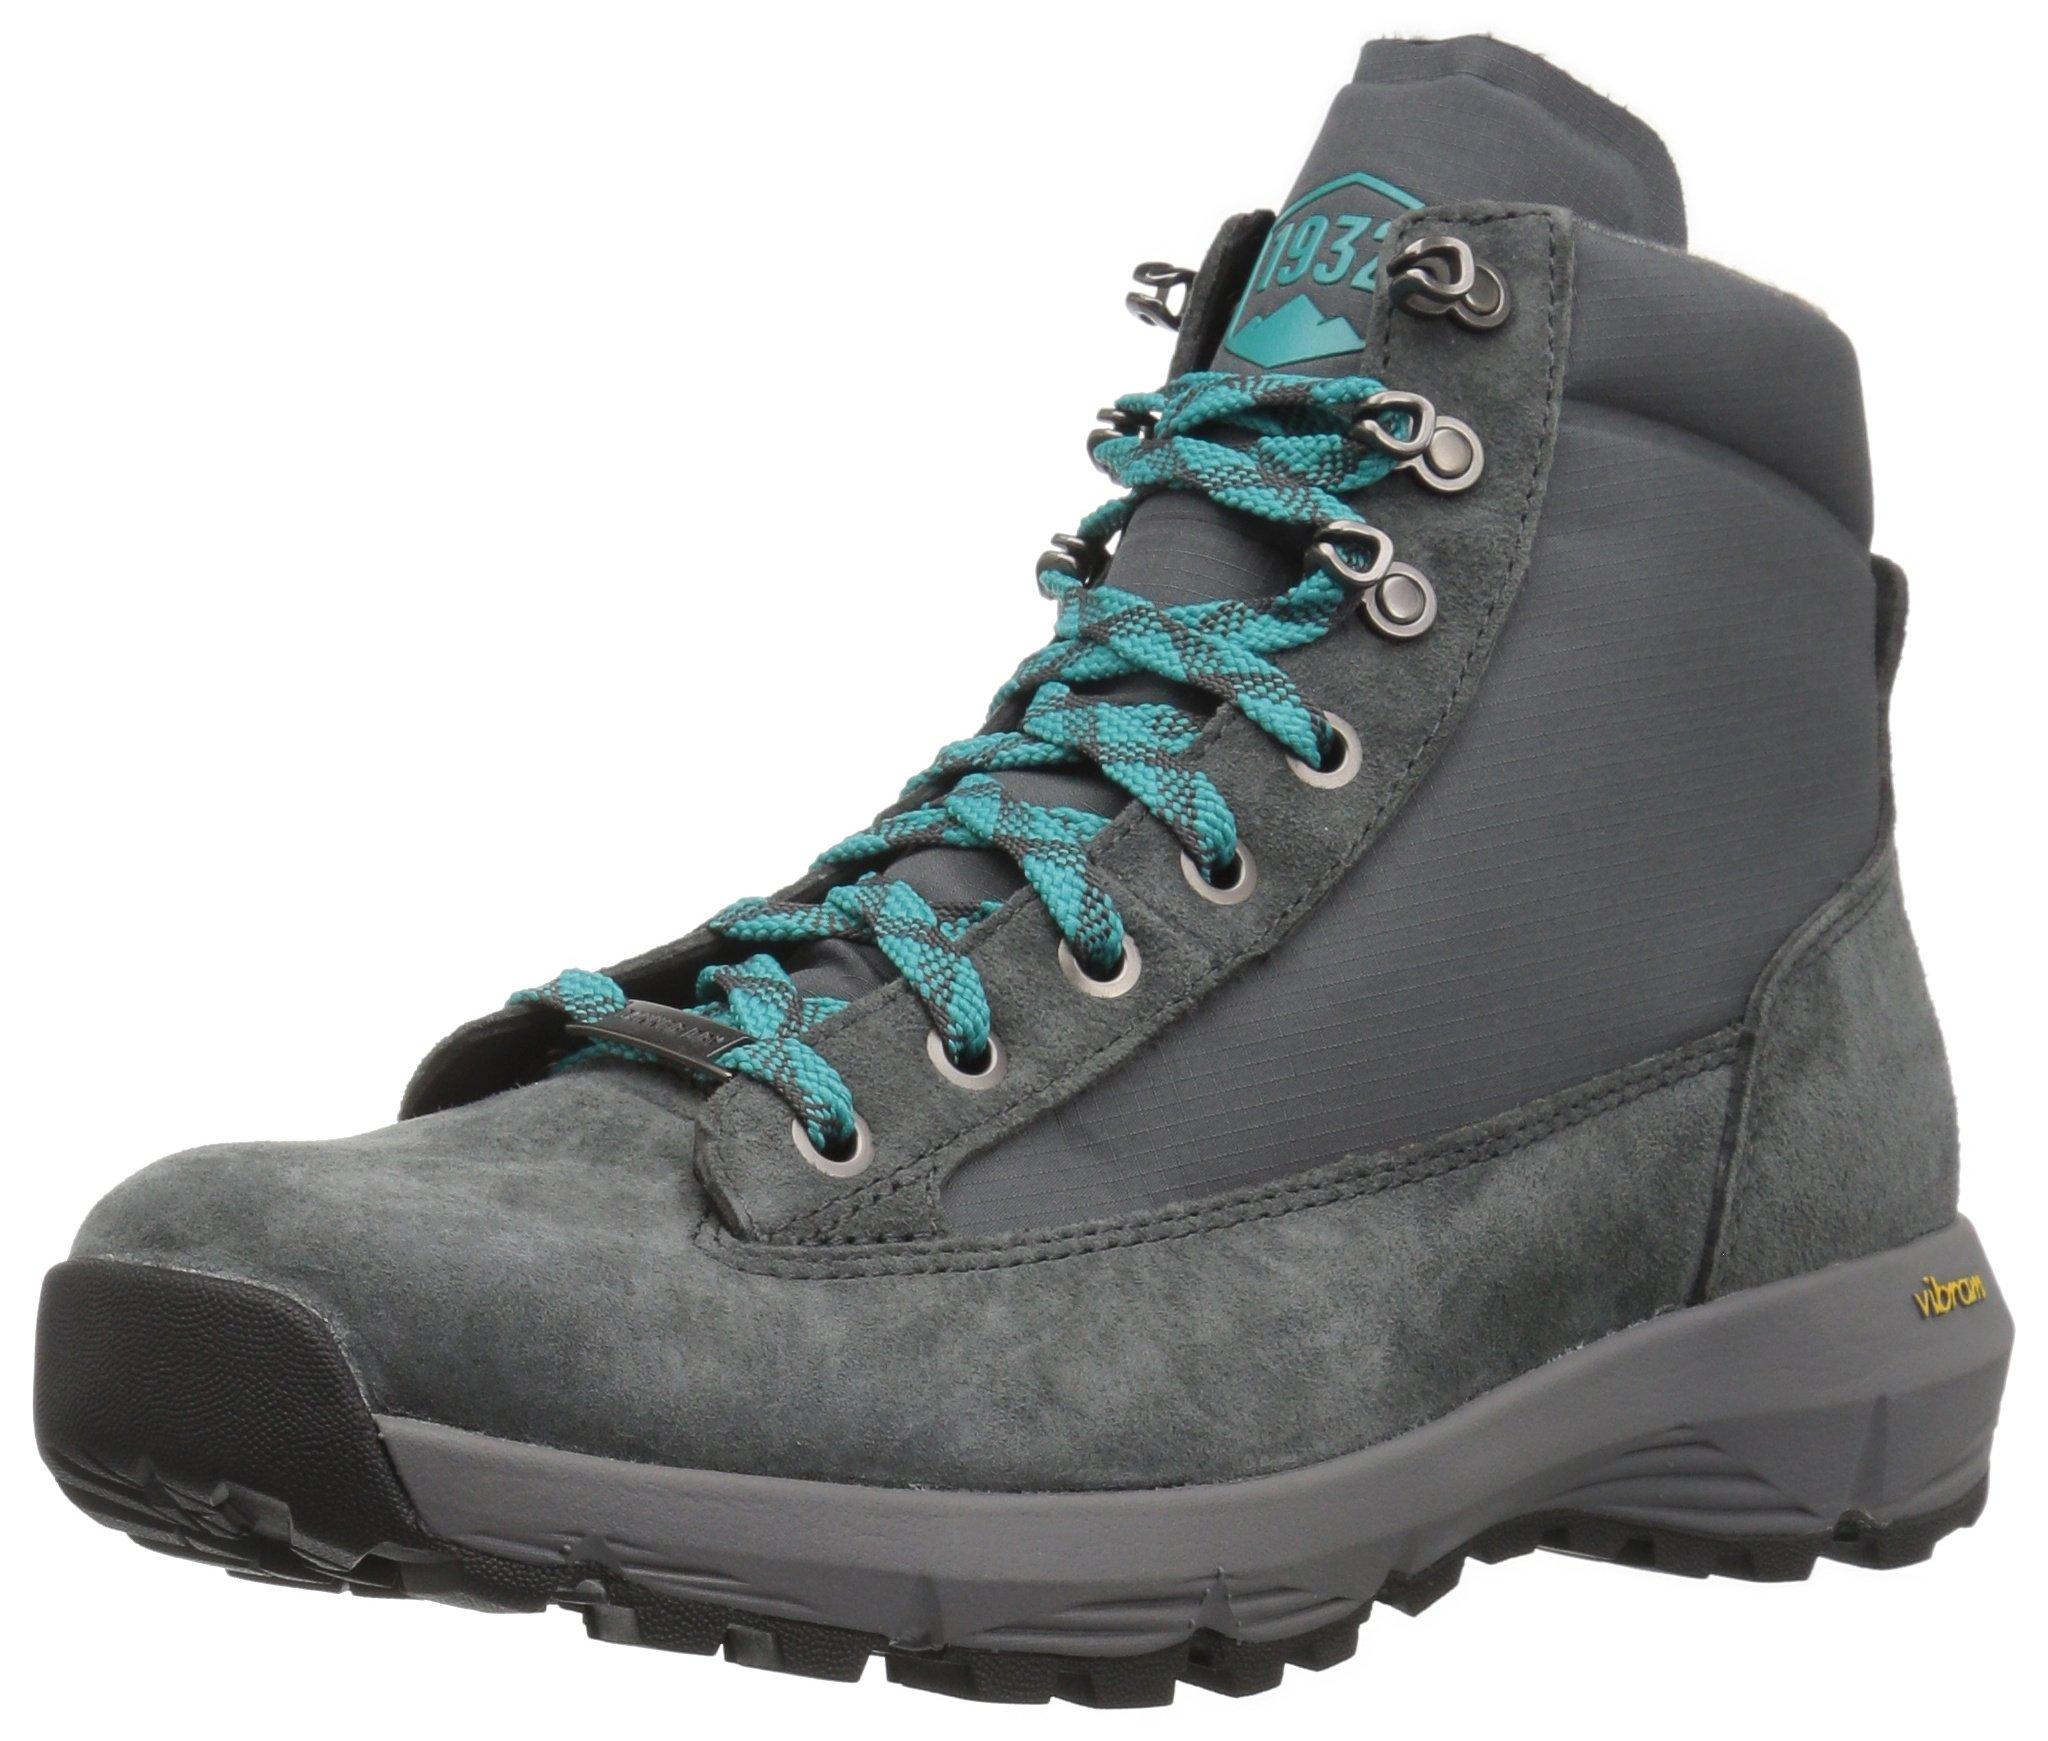 Danner Women's Explorer 650 6'' Hiking Boot, Gray/Bright Blue, 10.5 M US